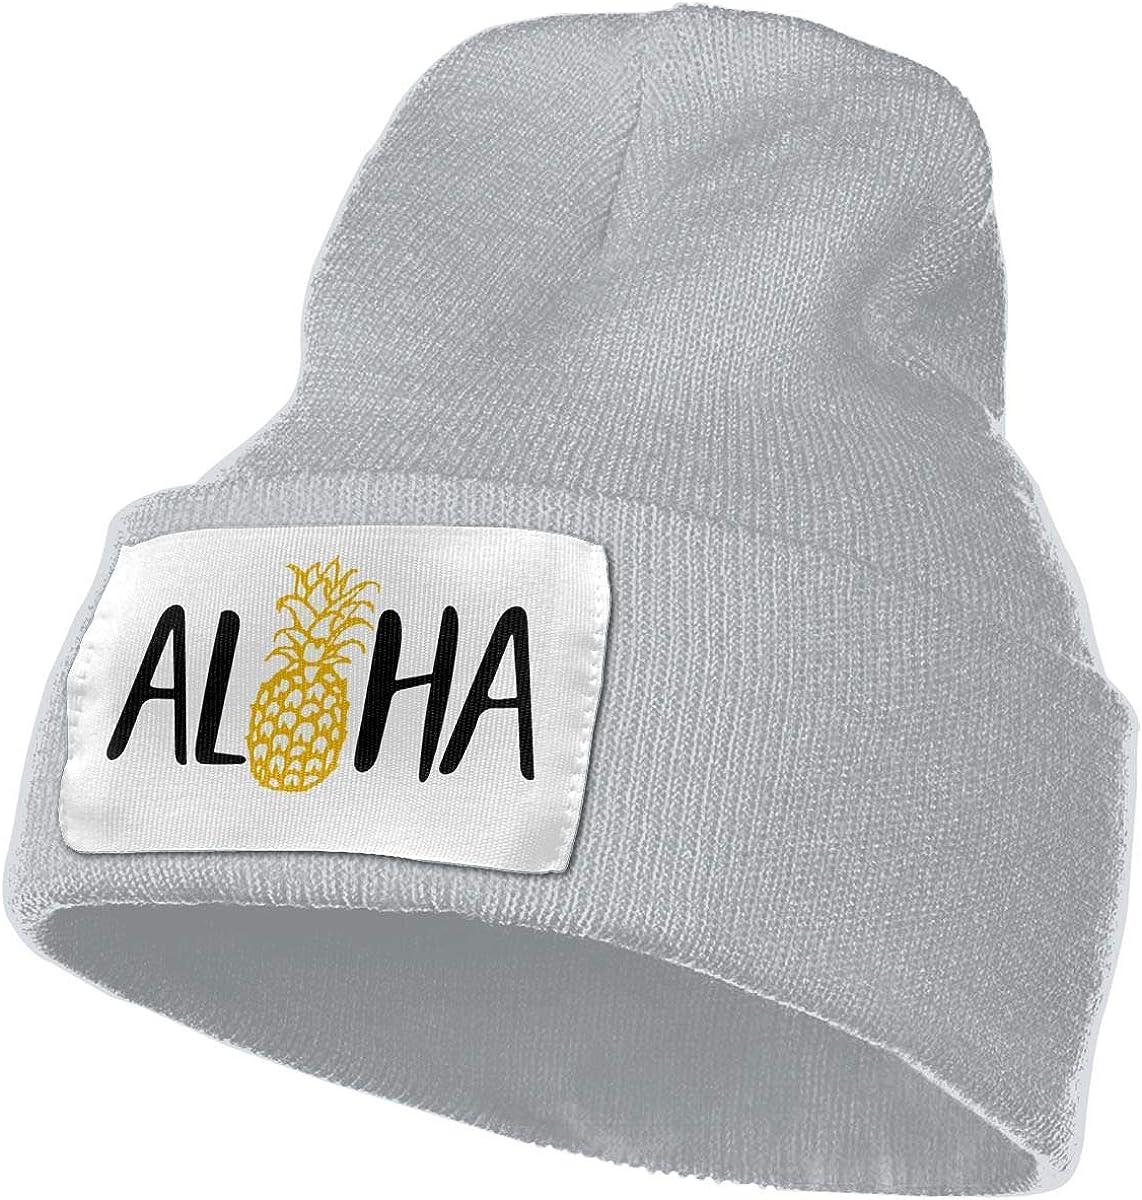 AZNM Pineapple Hawaii Hello Beanie Skull Cap Slouchy Knit Beanie Hats Plain Winter Hats for Men Women Daily